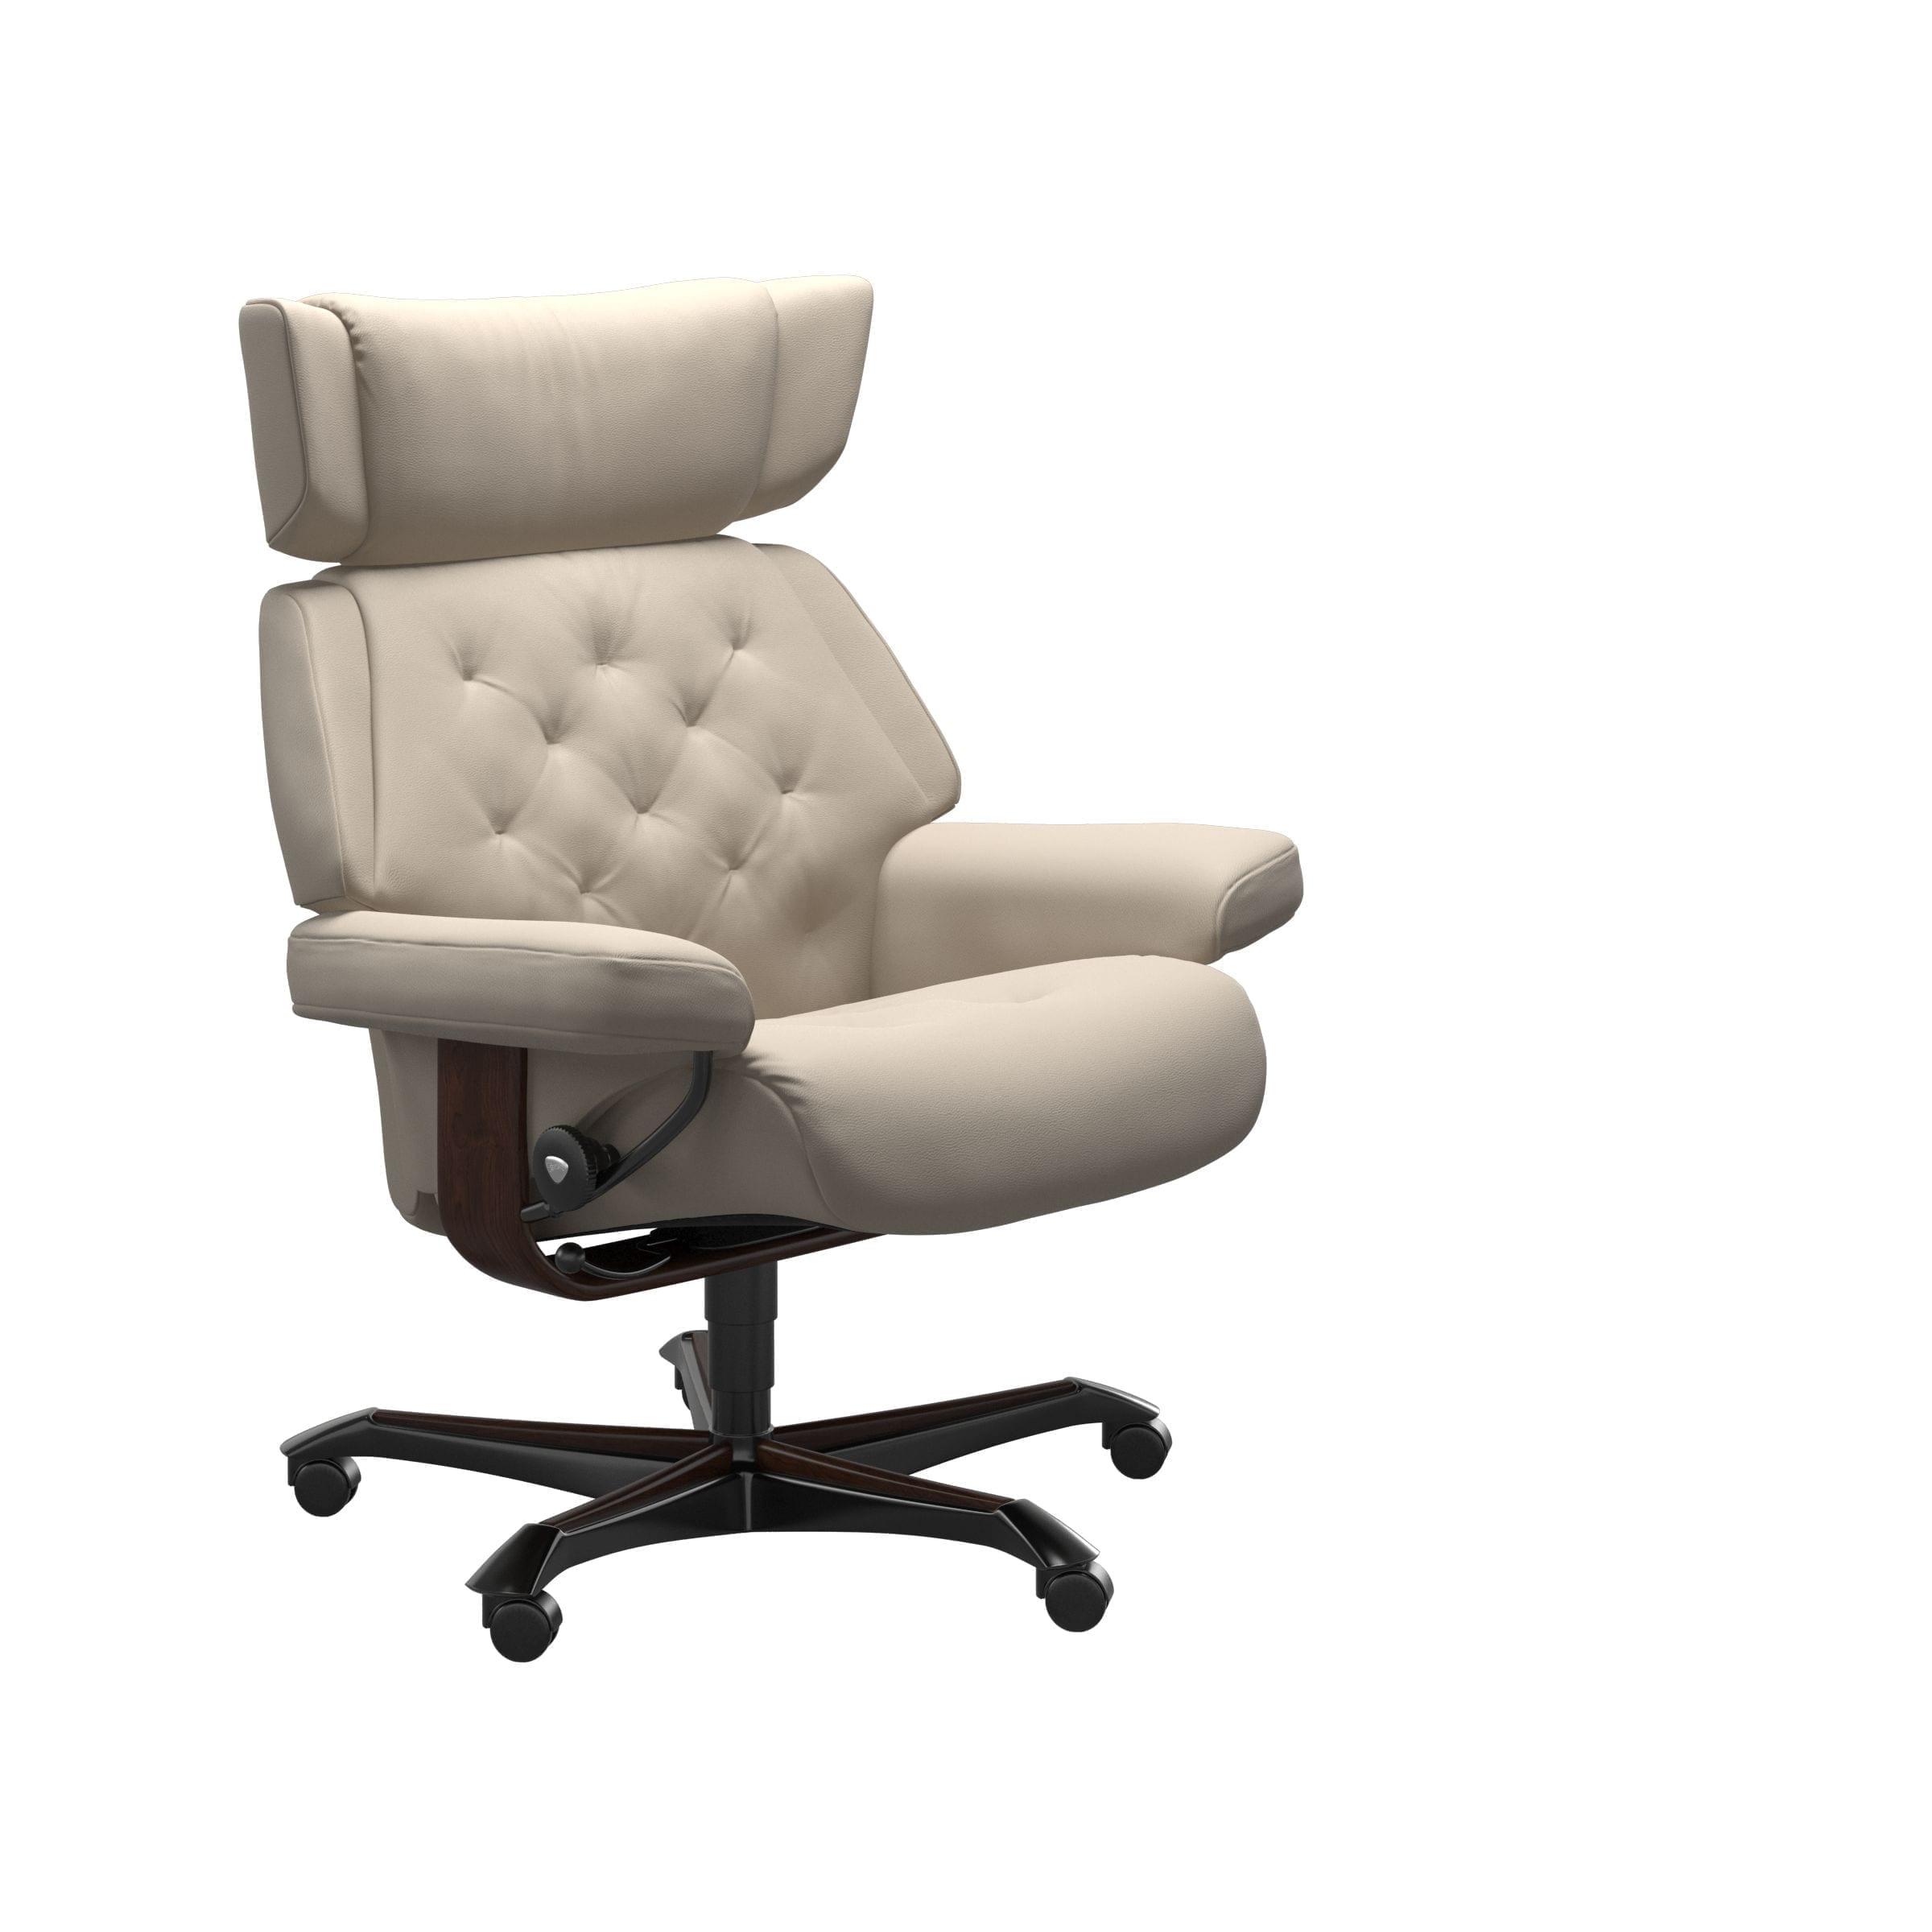 Stressless Skyline Office Chair 1